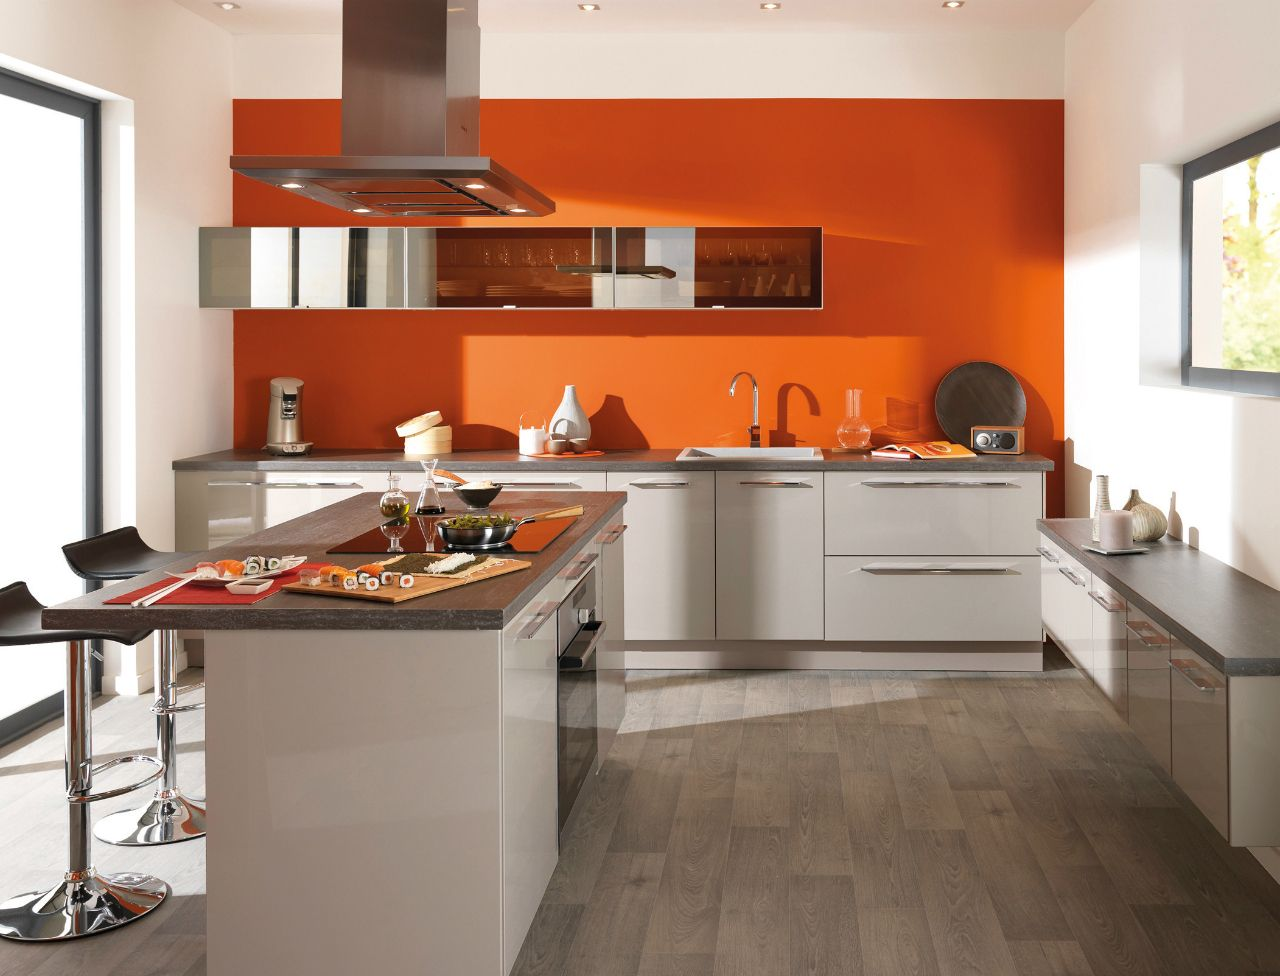 Cuisine Orange | Eleonore Guillon Eleonoreguillon Sur Pinterest